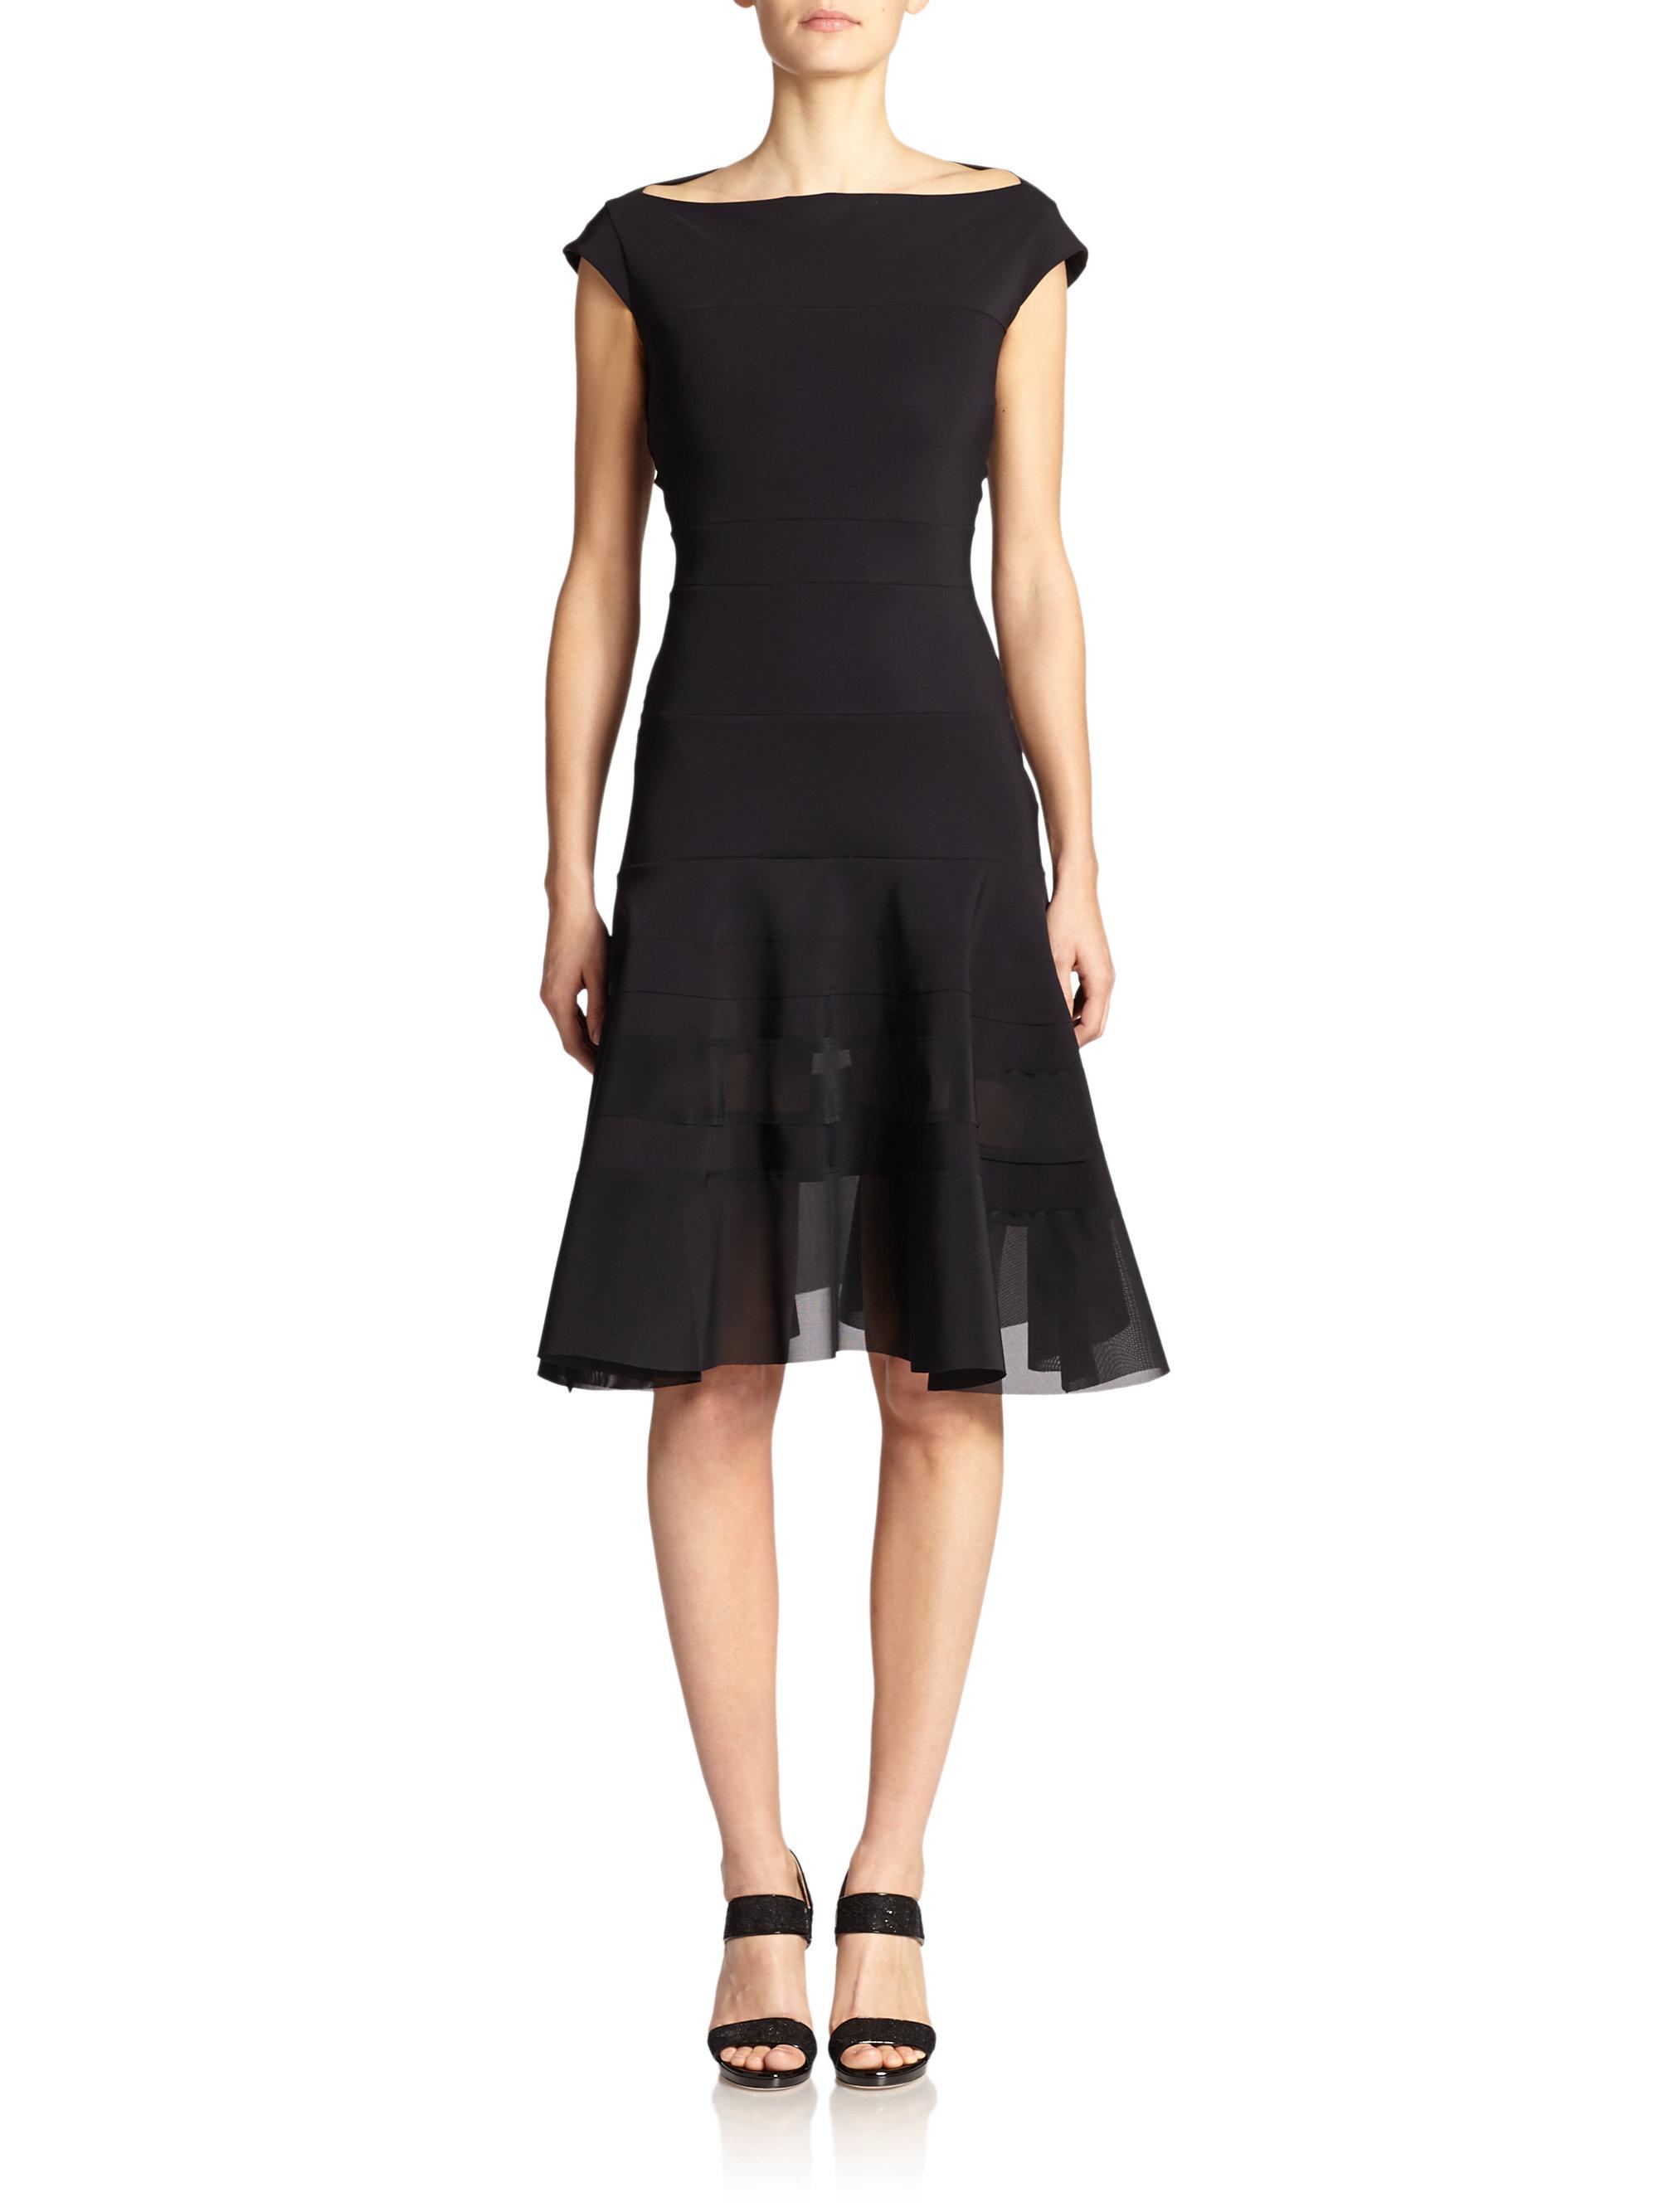 db3475a7586 Lyst - La Petite Robe Di Chiara Boni Olanda Illusion Dress in Black